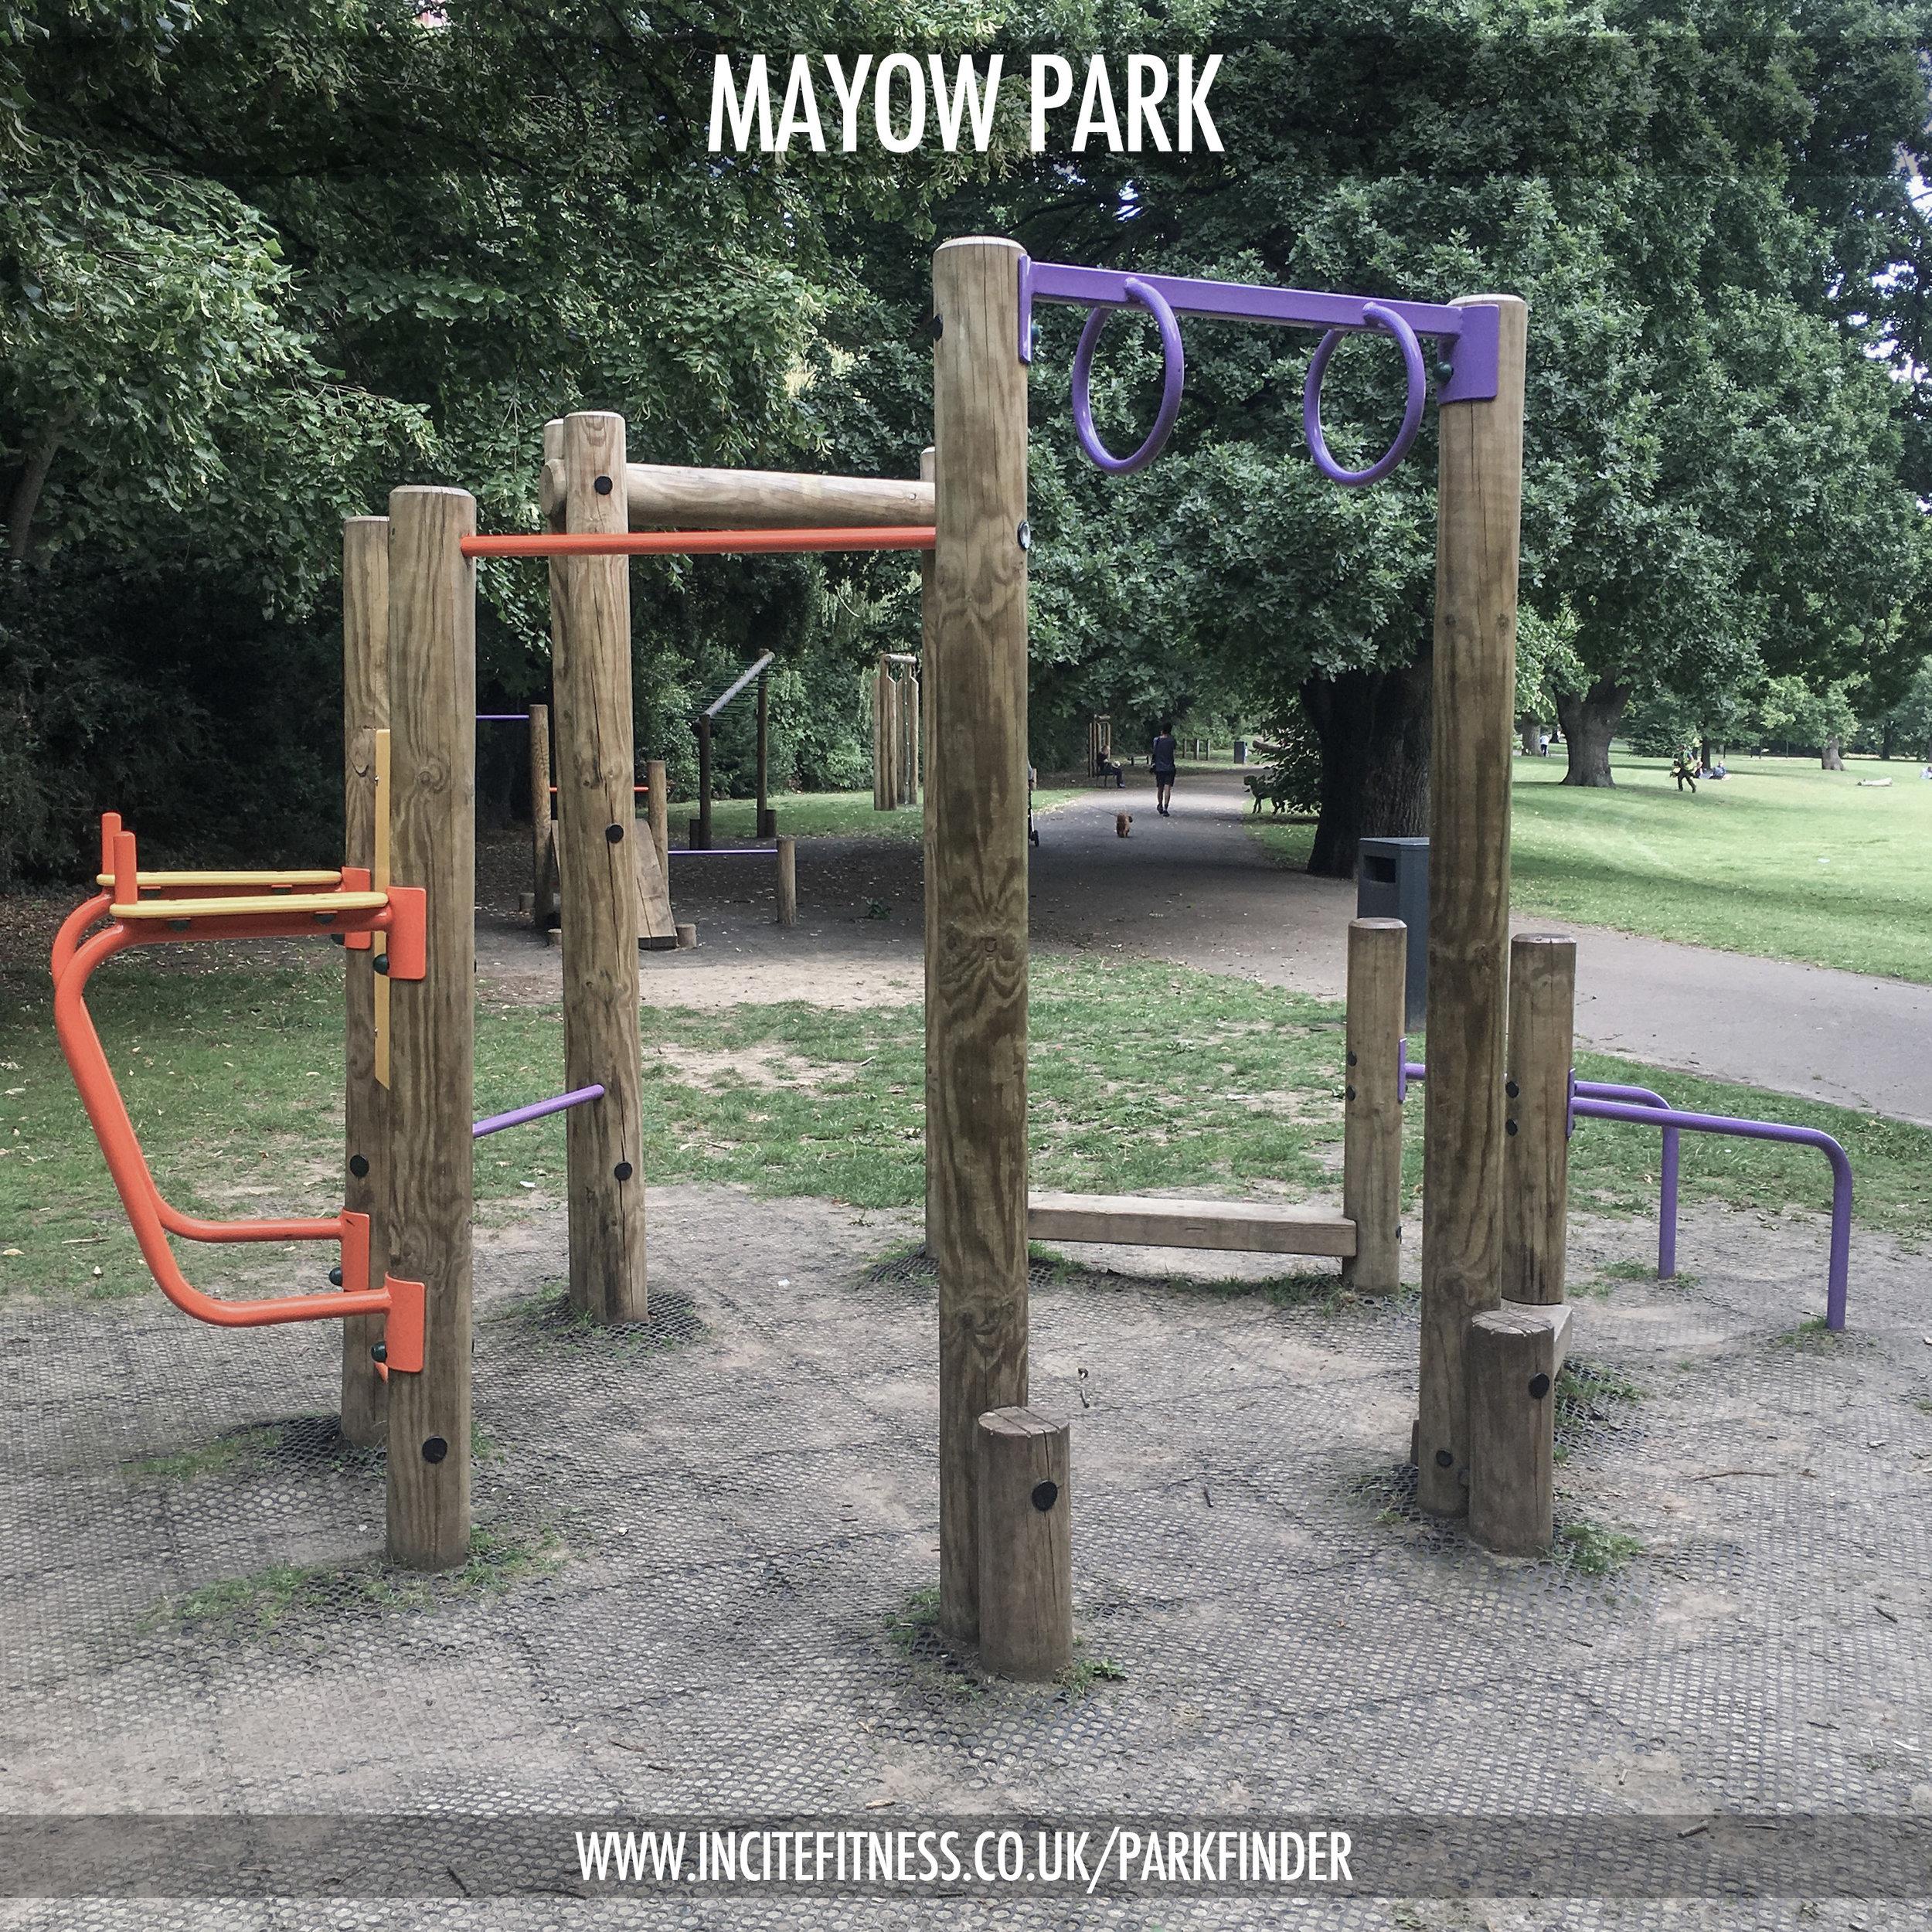 Mayow park 01 pull up bar.jpg